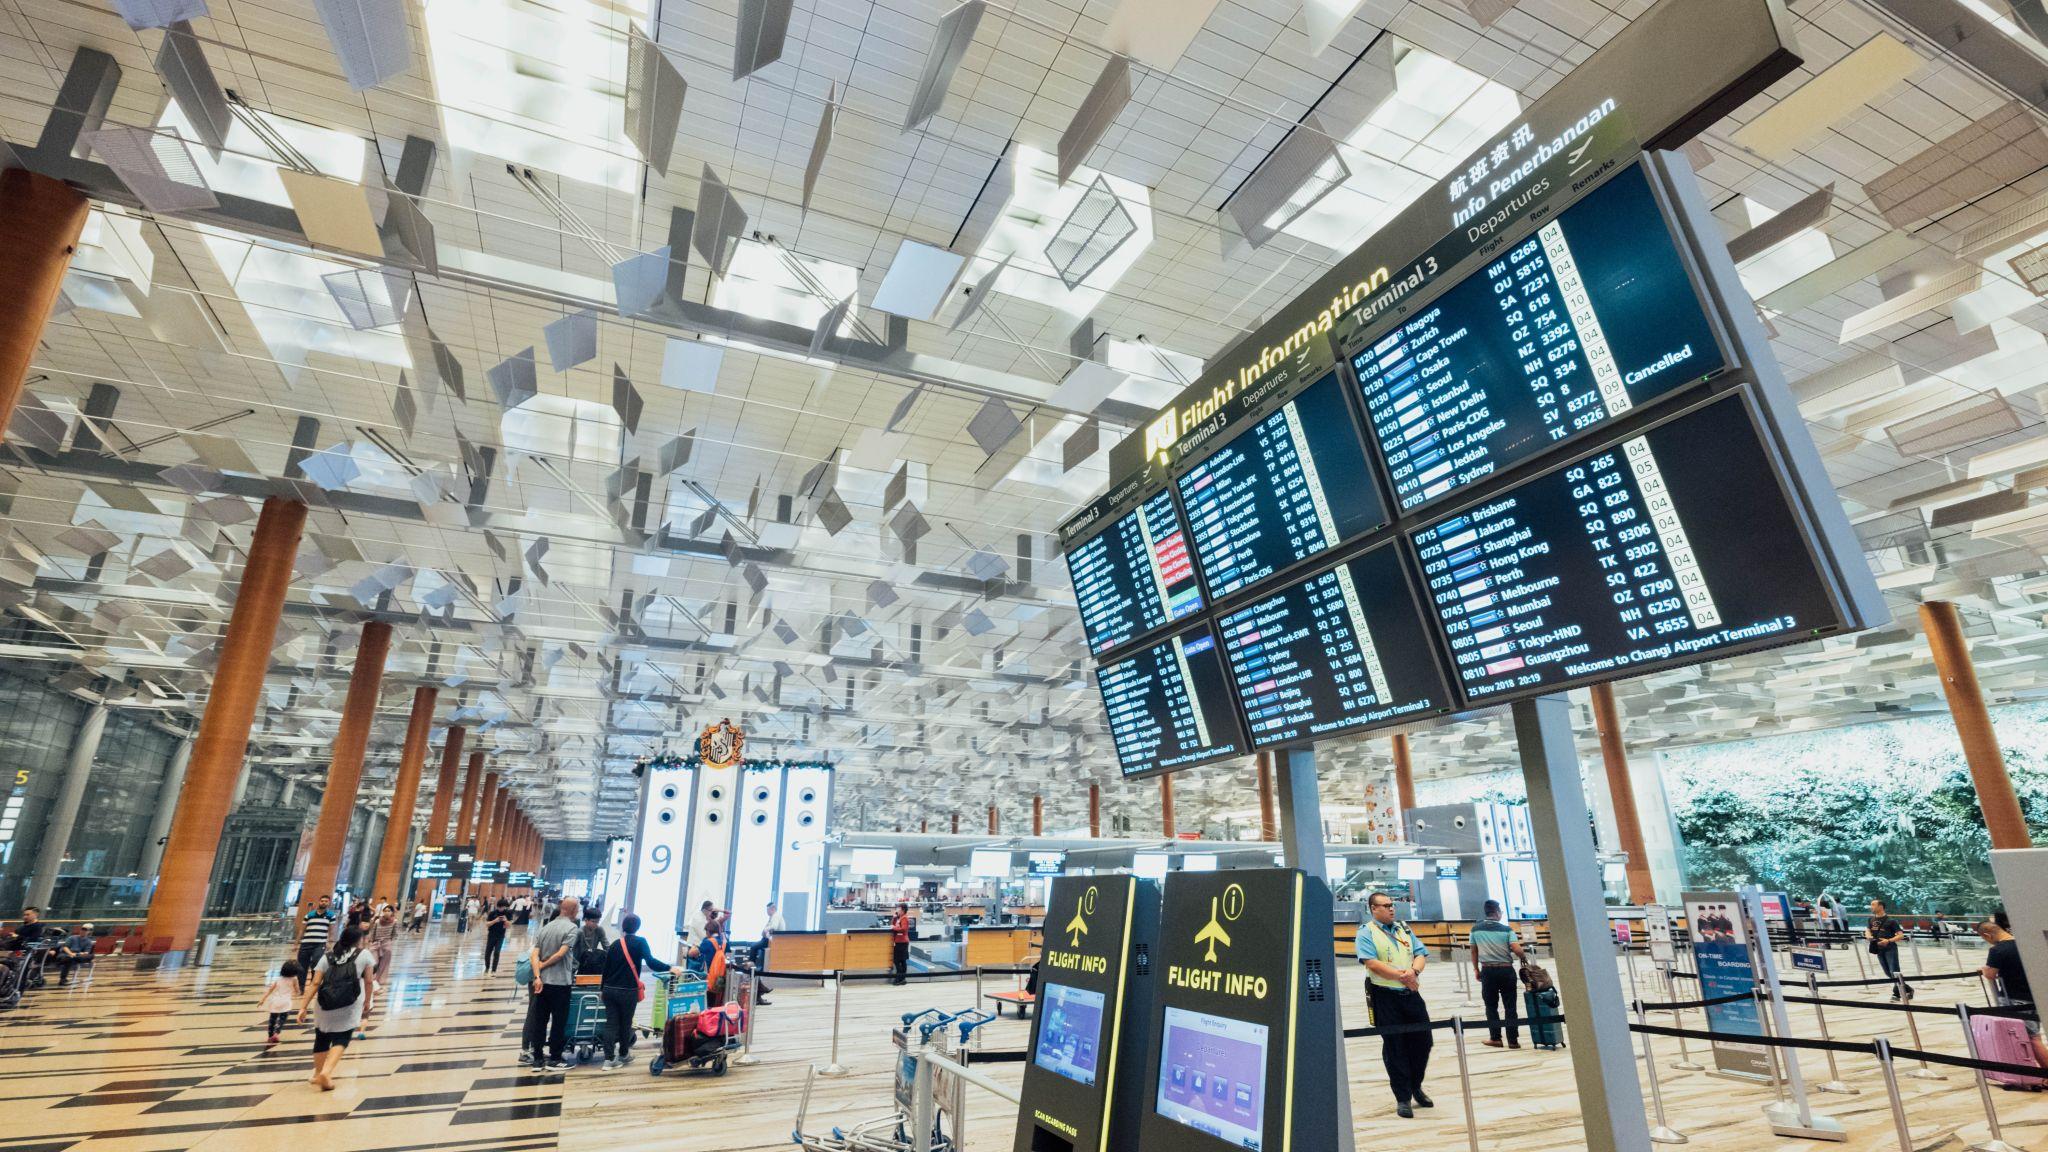 airport WiFi passwords list